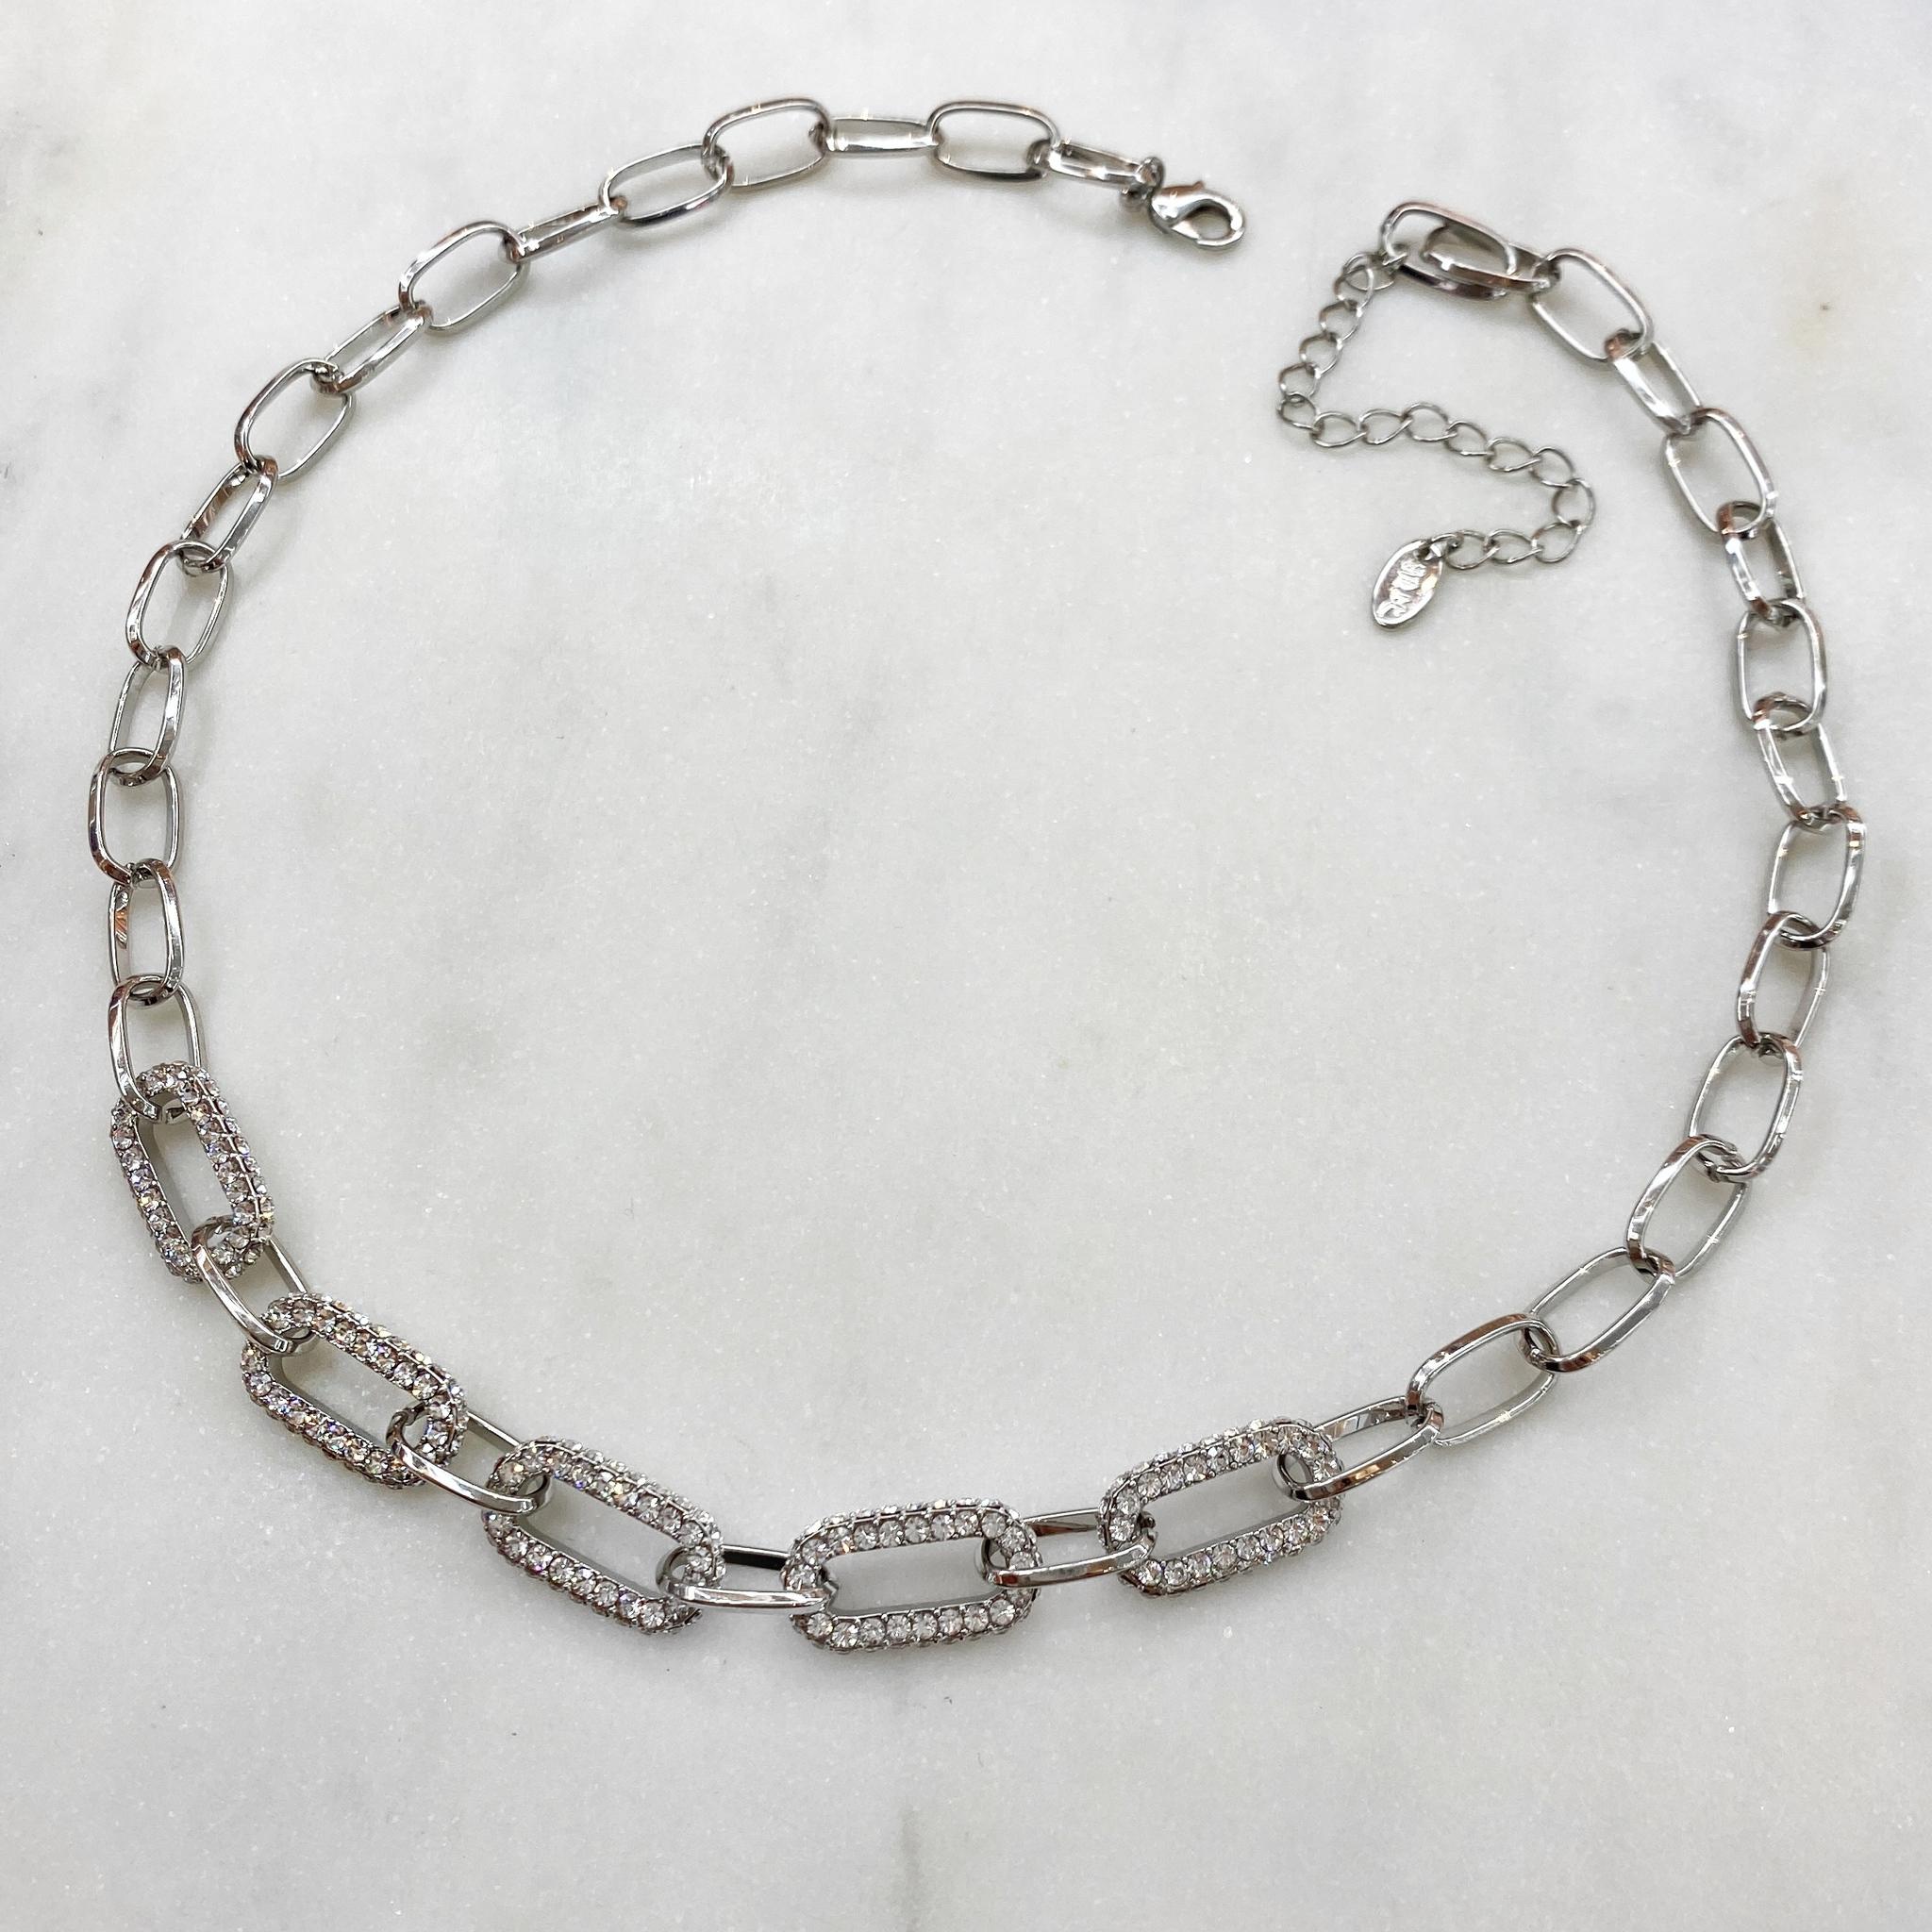 Колье-цепь с кристаллами Swarovski (серебристый)